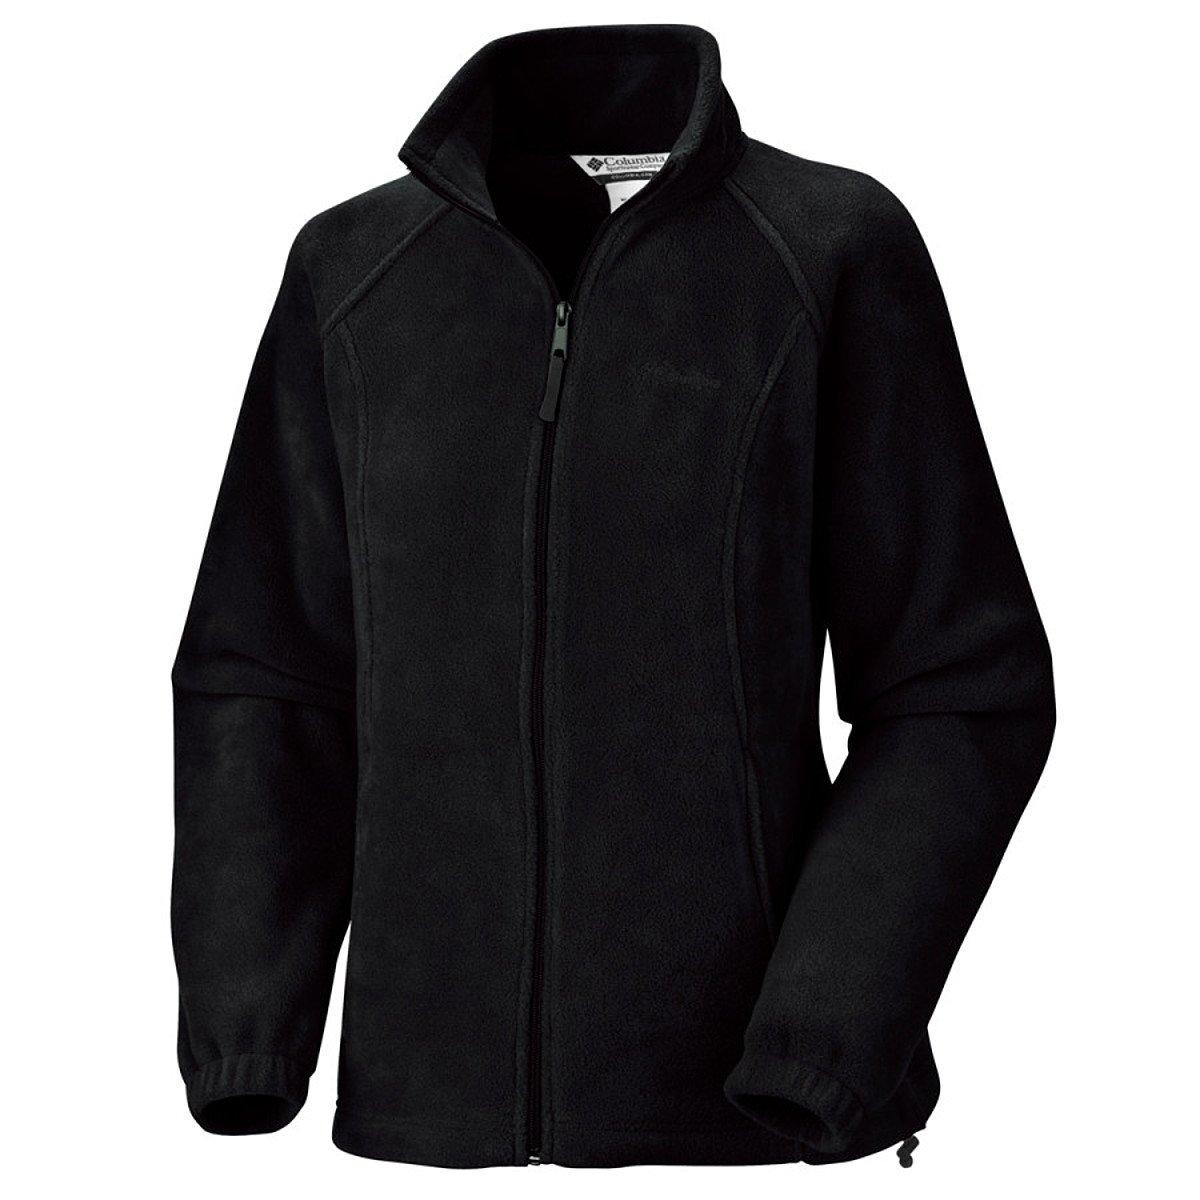 Columbia Women's Benton Springs Classic Fit Full Zip Soft Fleece Jacket, black, XL by Columbia